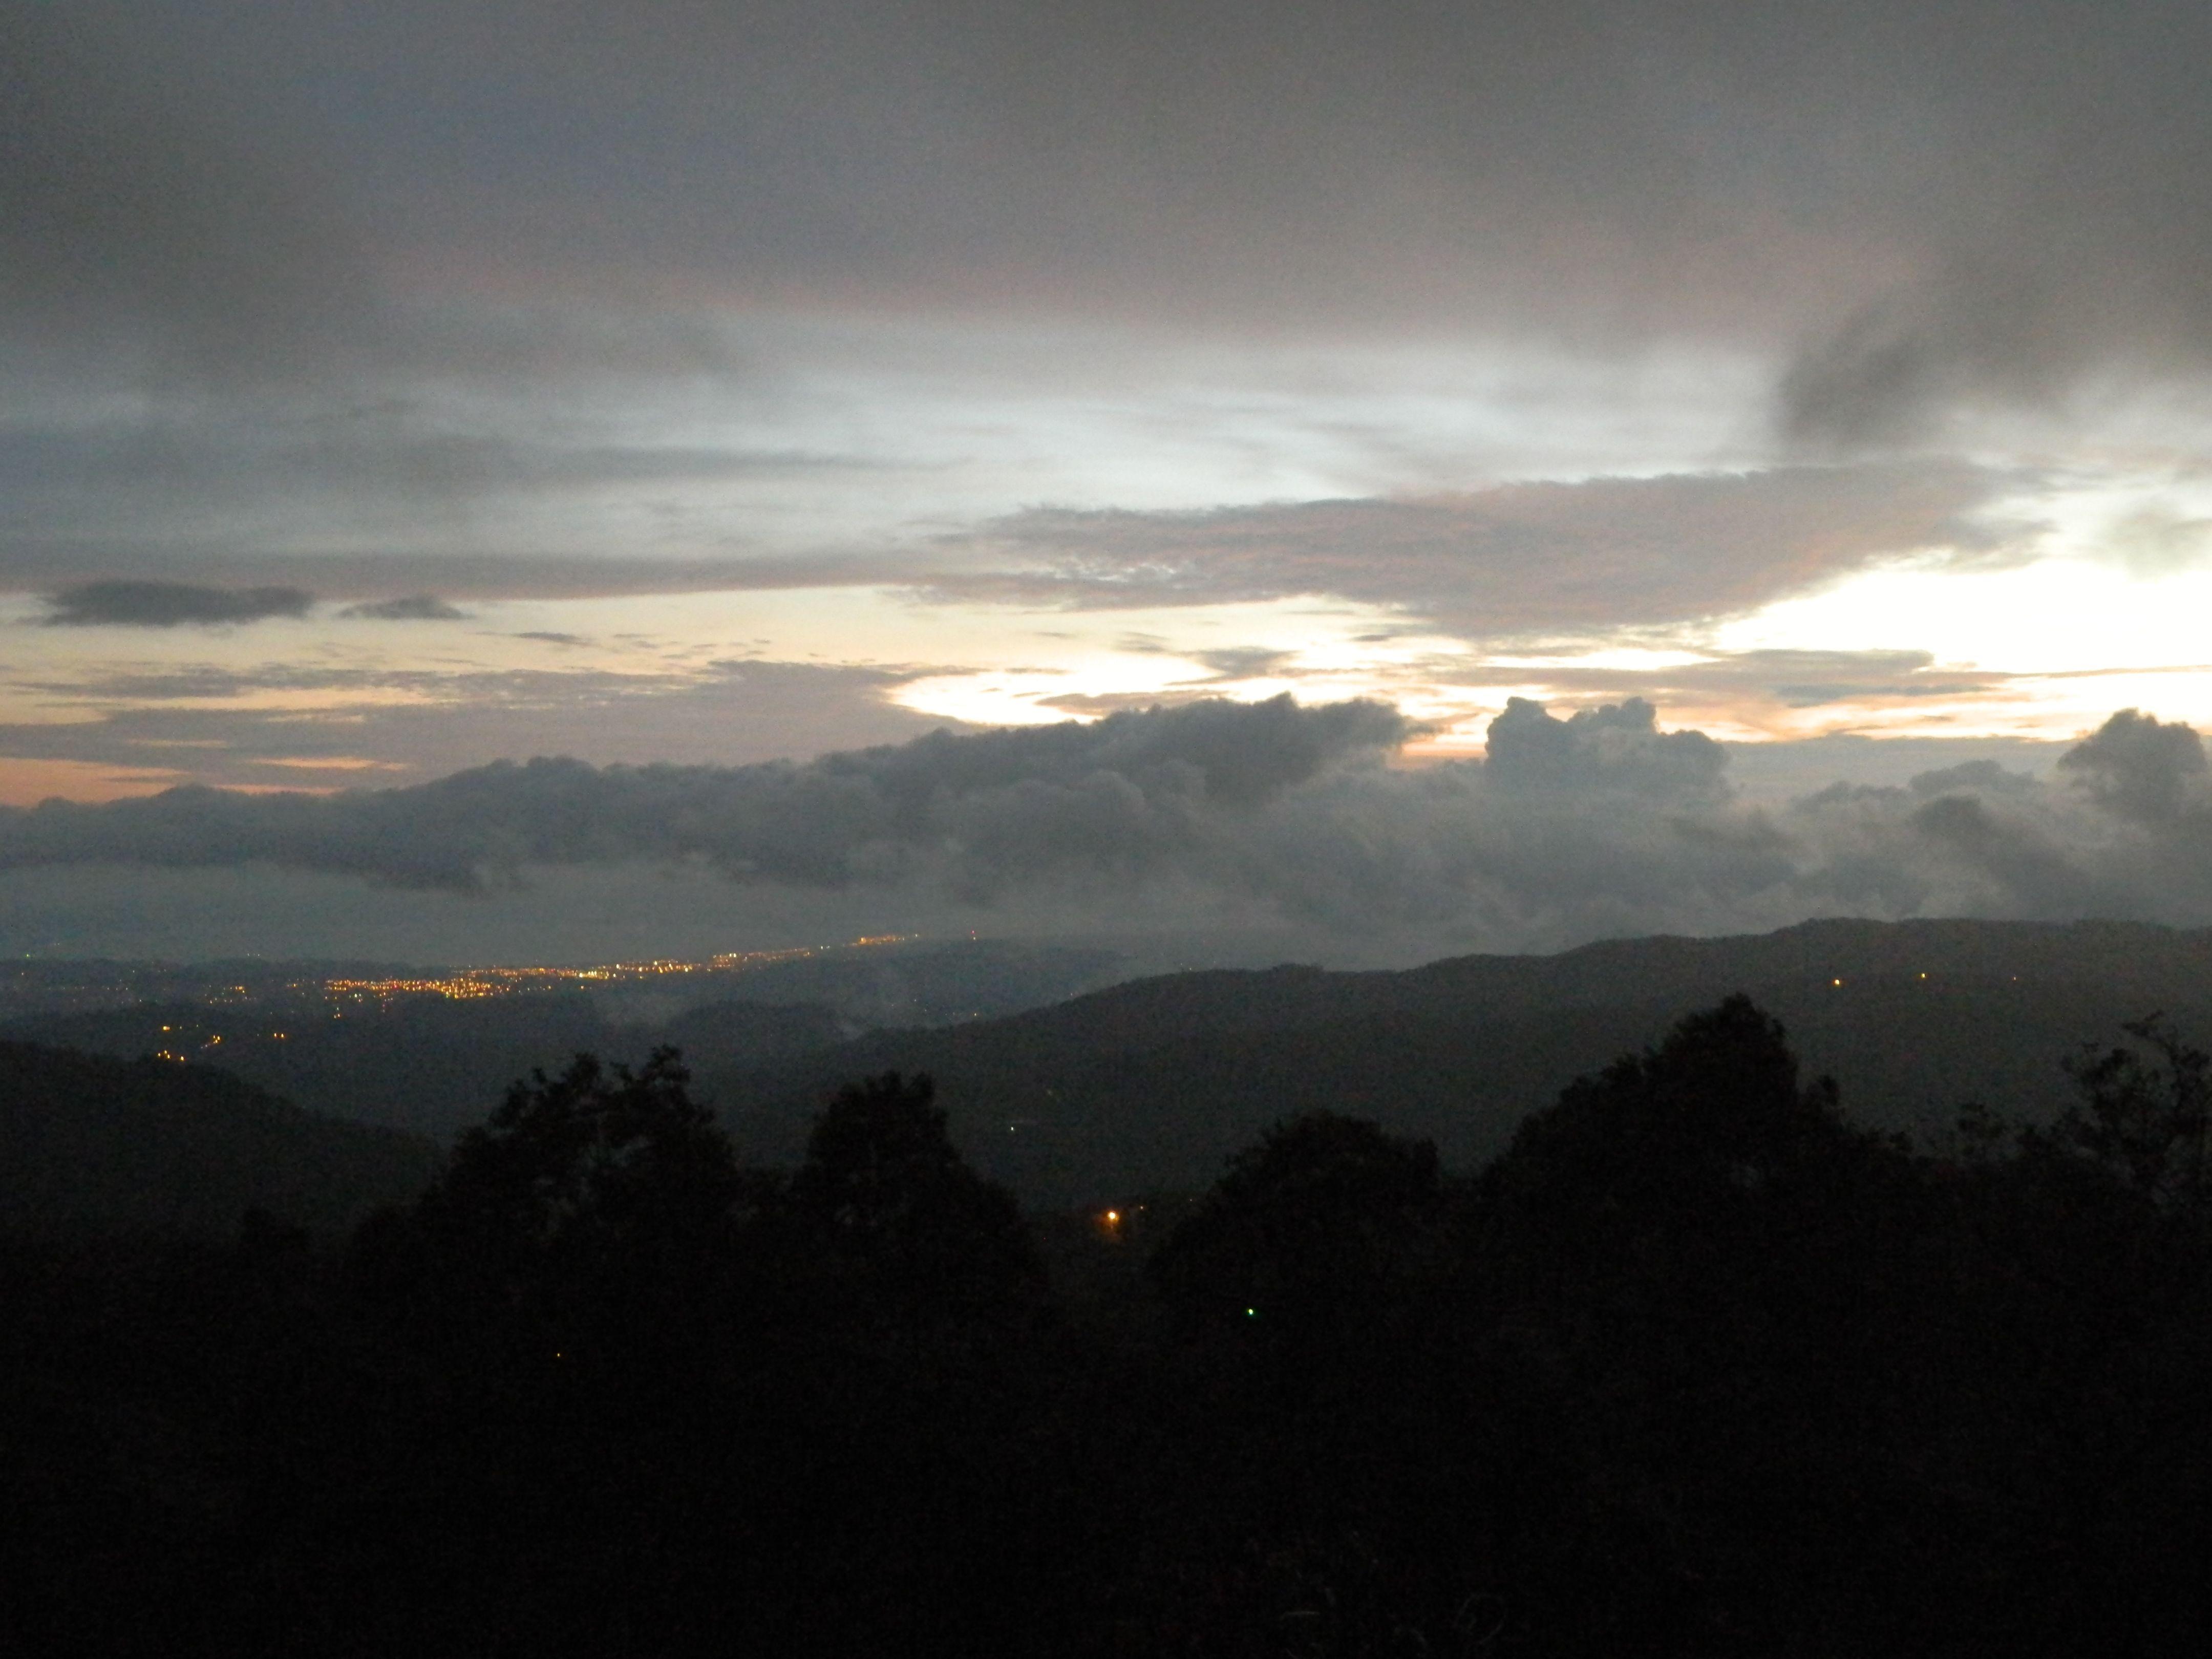 Costa Rica - sunset over Puntarenas